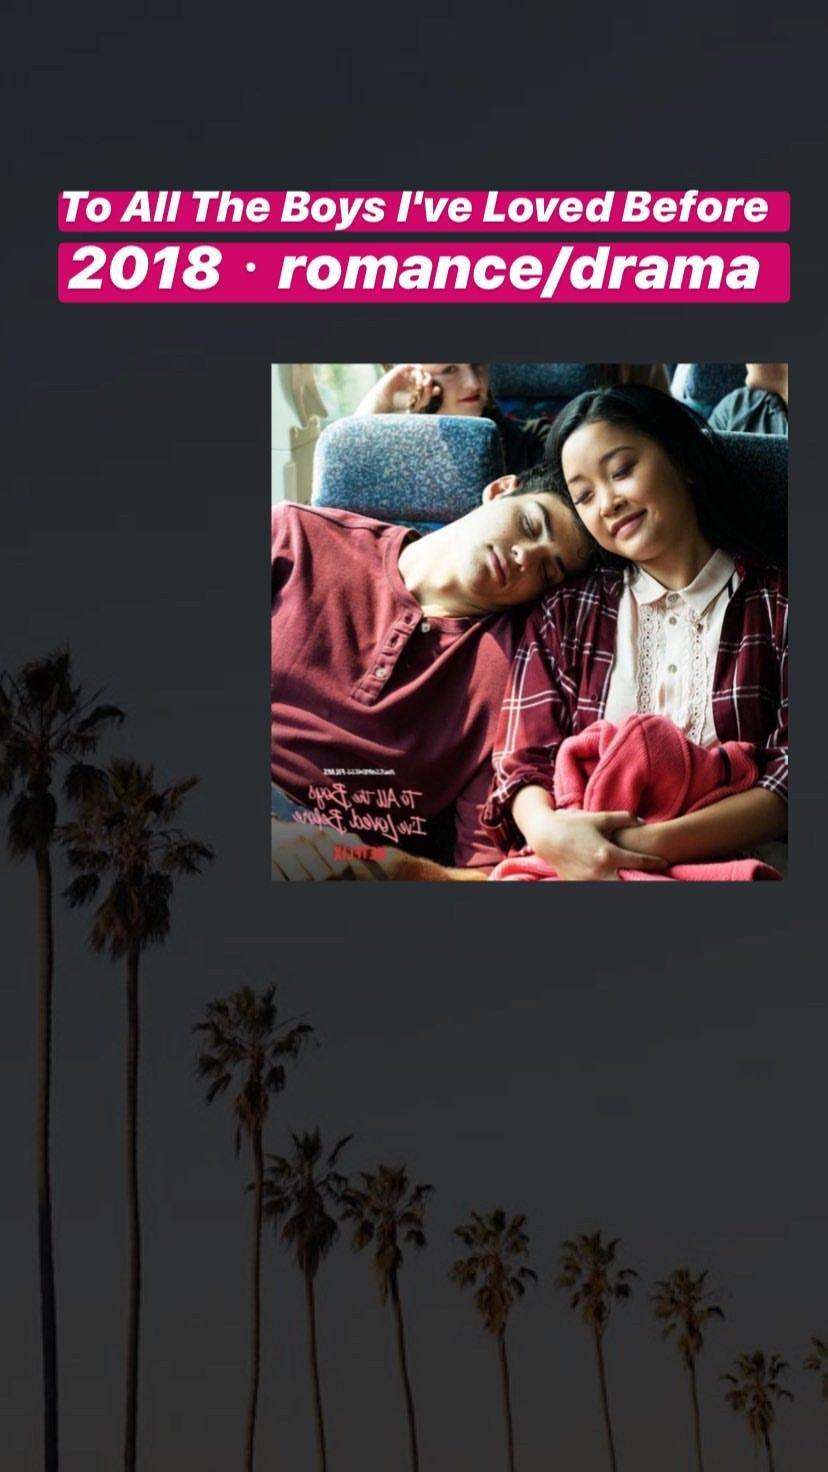 Film Romantis Barat 2018 : romantis, barat, Loved, Before, Romantis,, Barat,